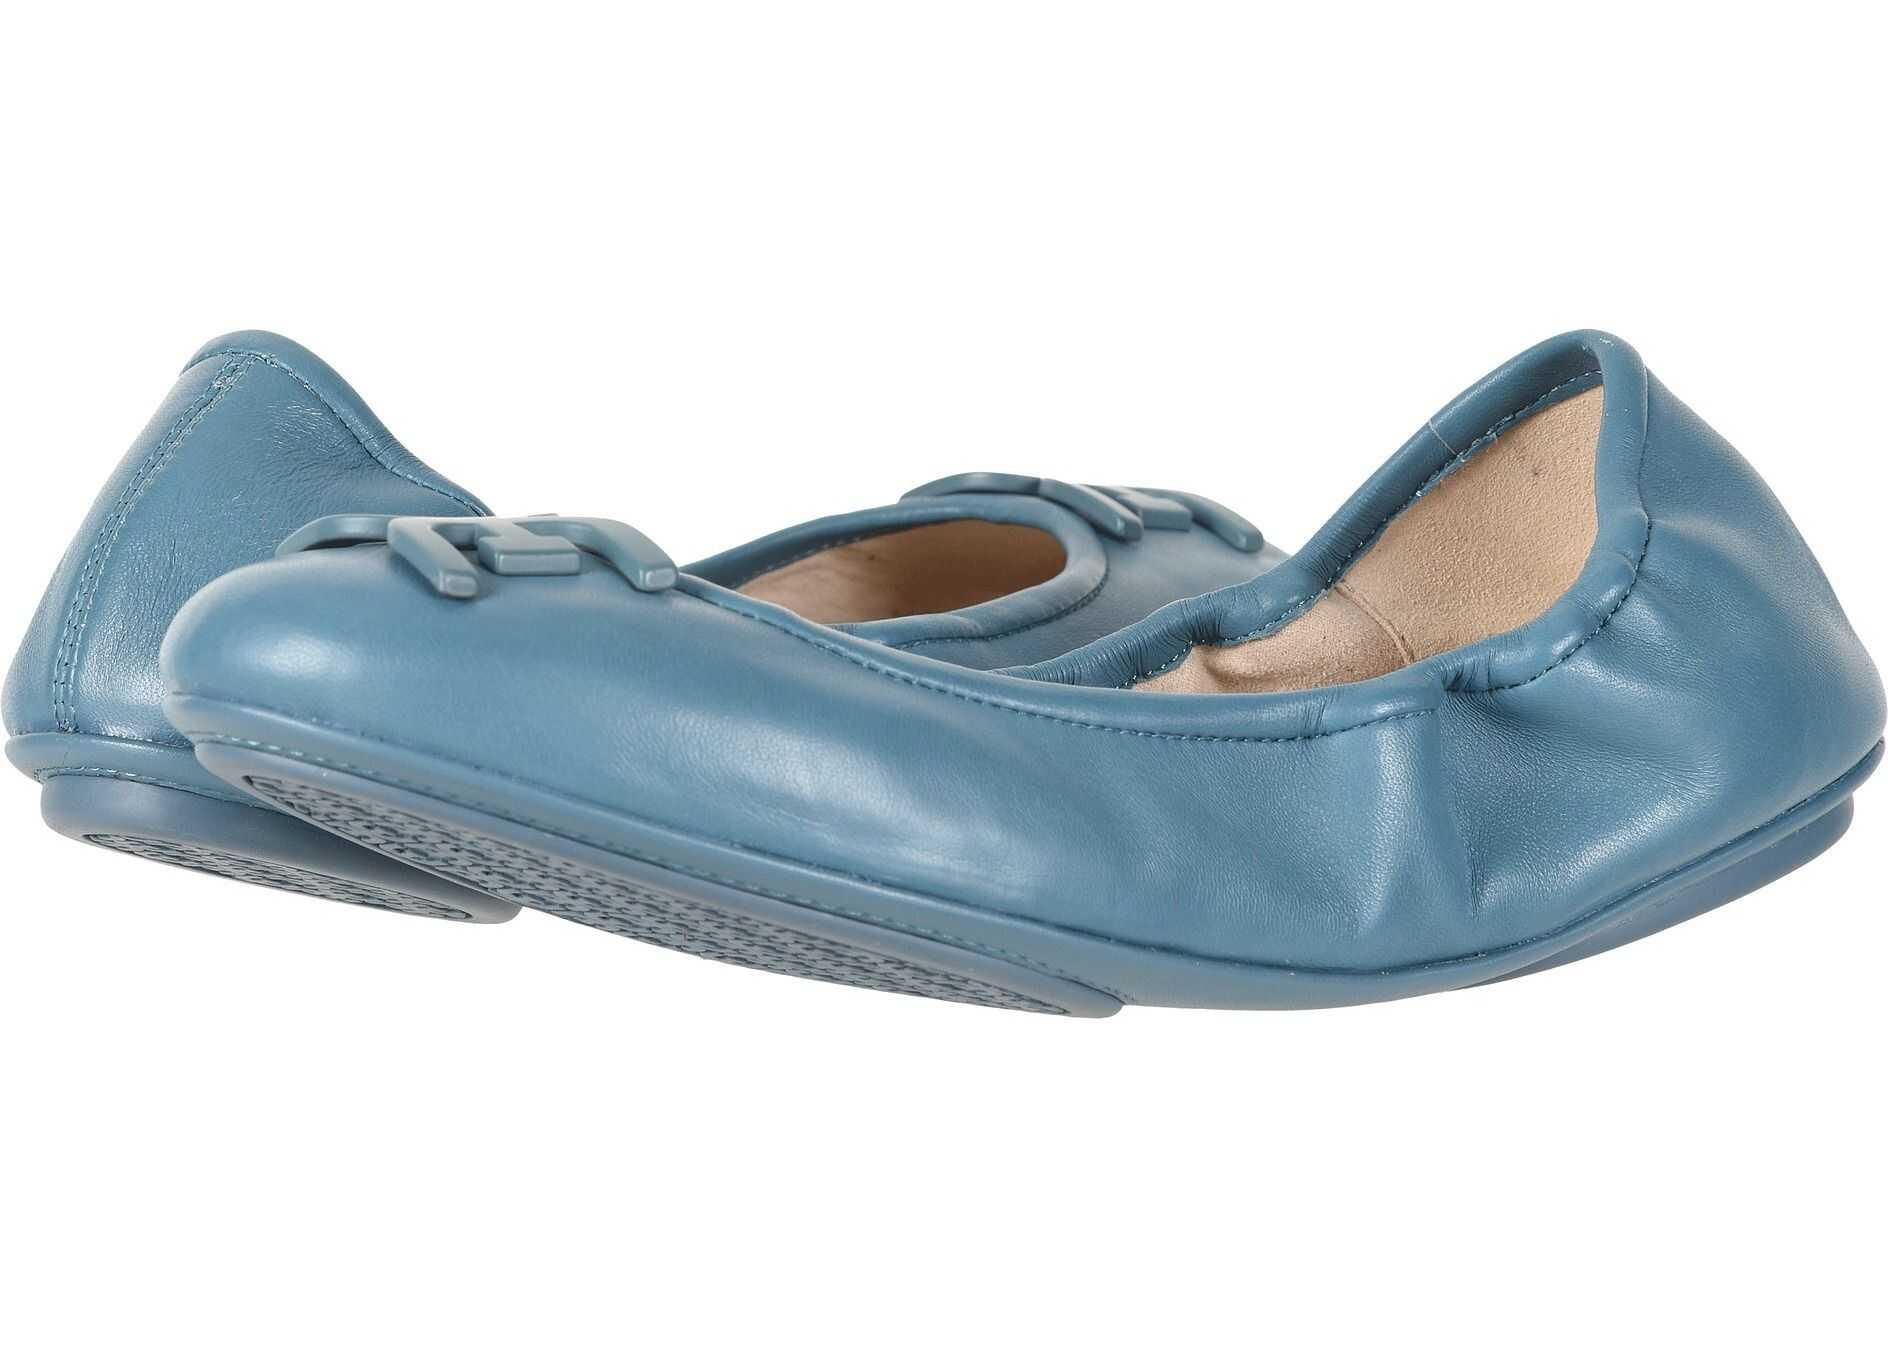 Sam Edelman Florence Denim Blue Nappa Luva Leather